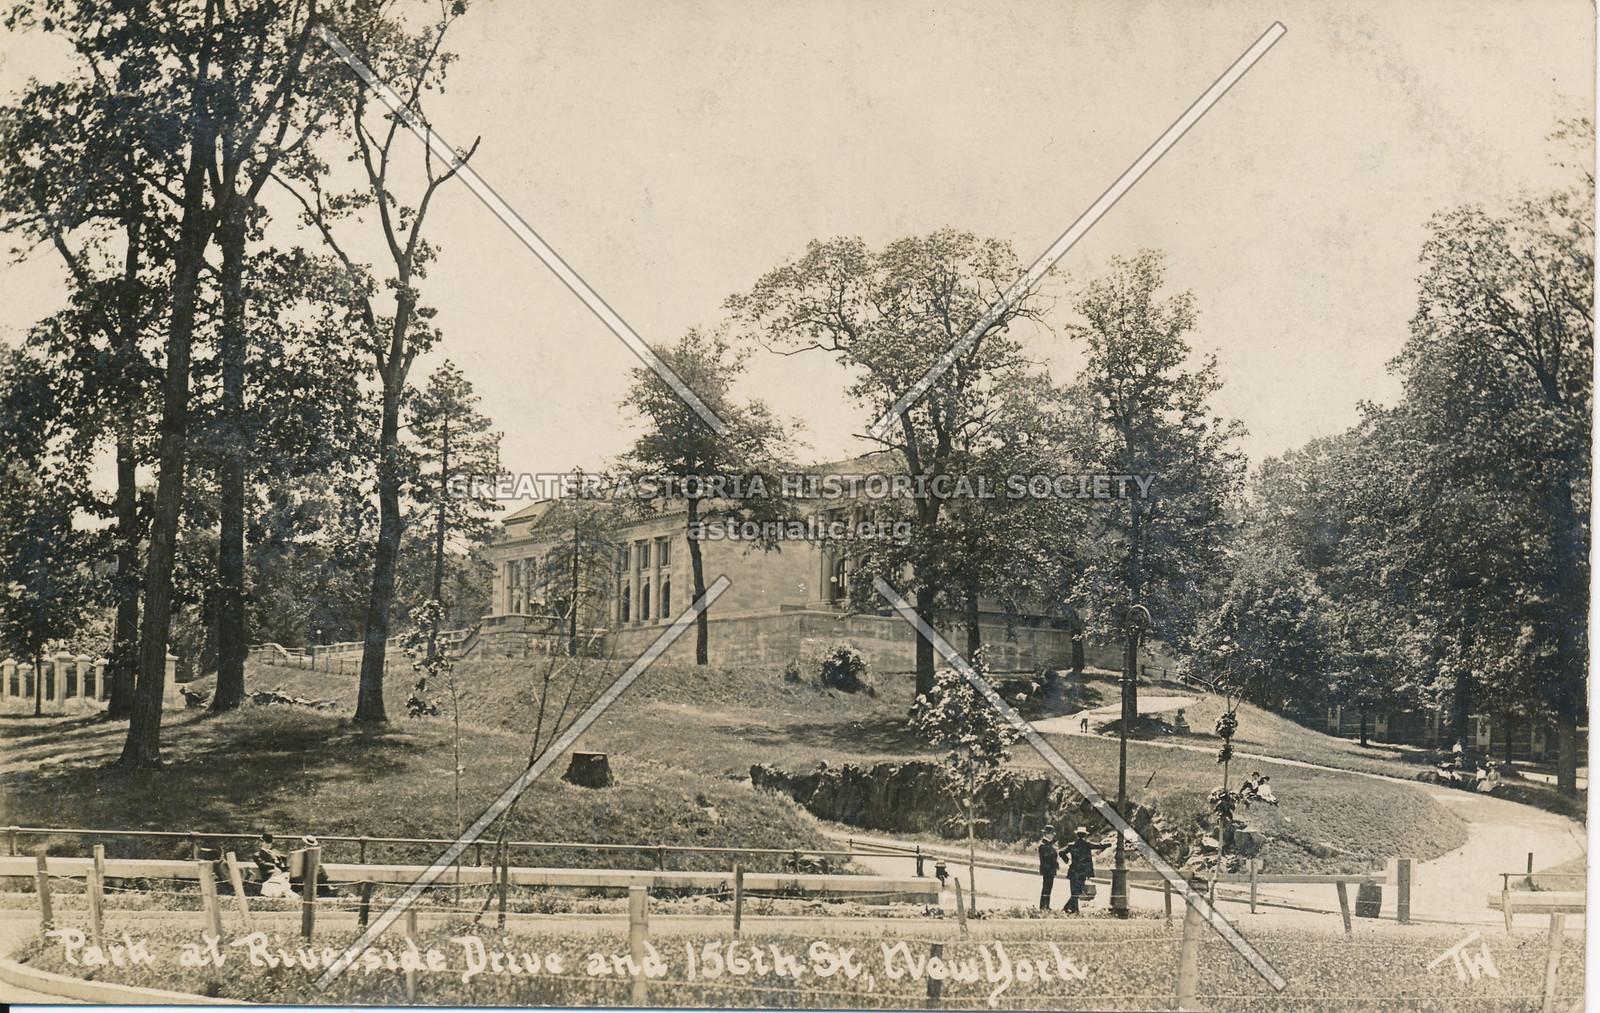 Park at Riverside Drive & 156th St., N.Y.